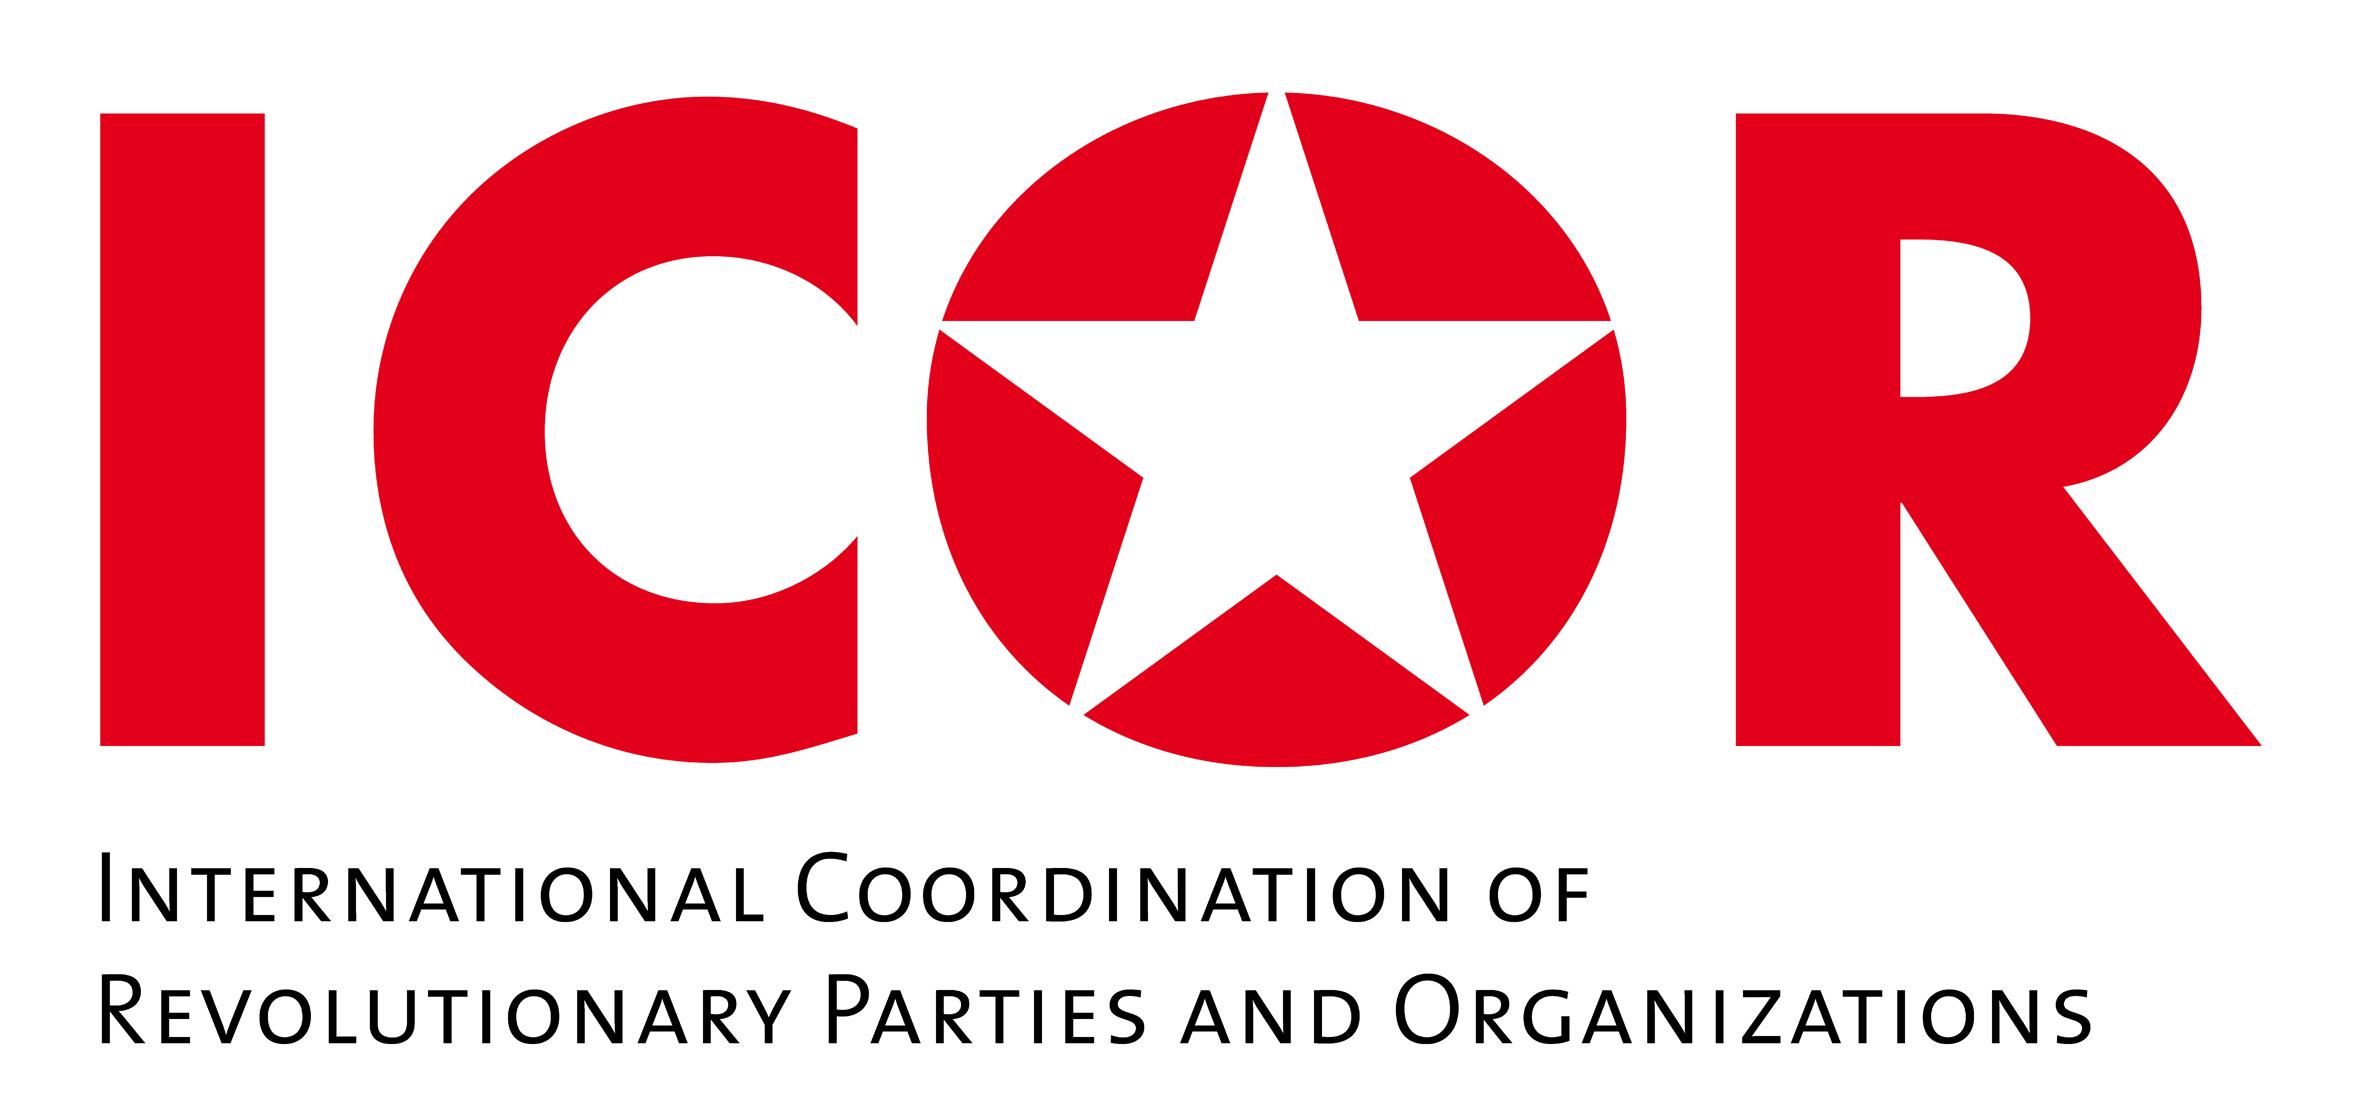 ICOR resolution against the blockade  of Nepal and Rojava